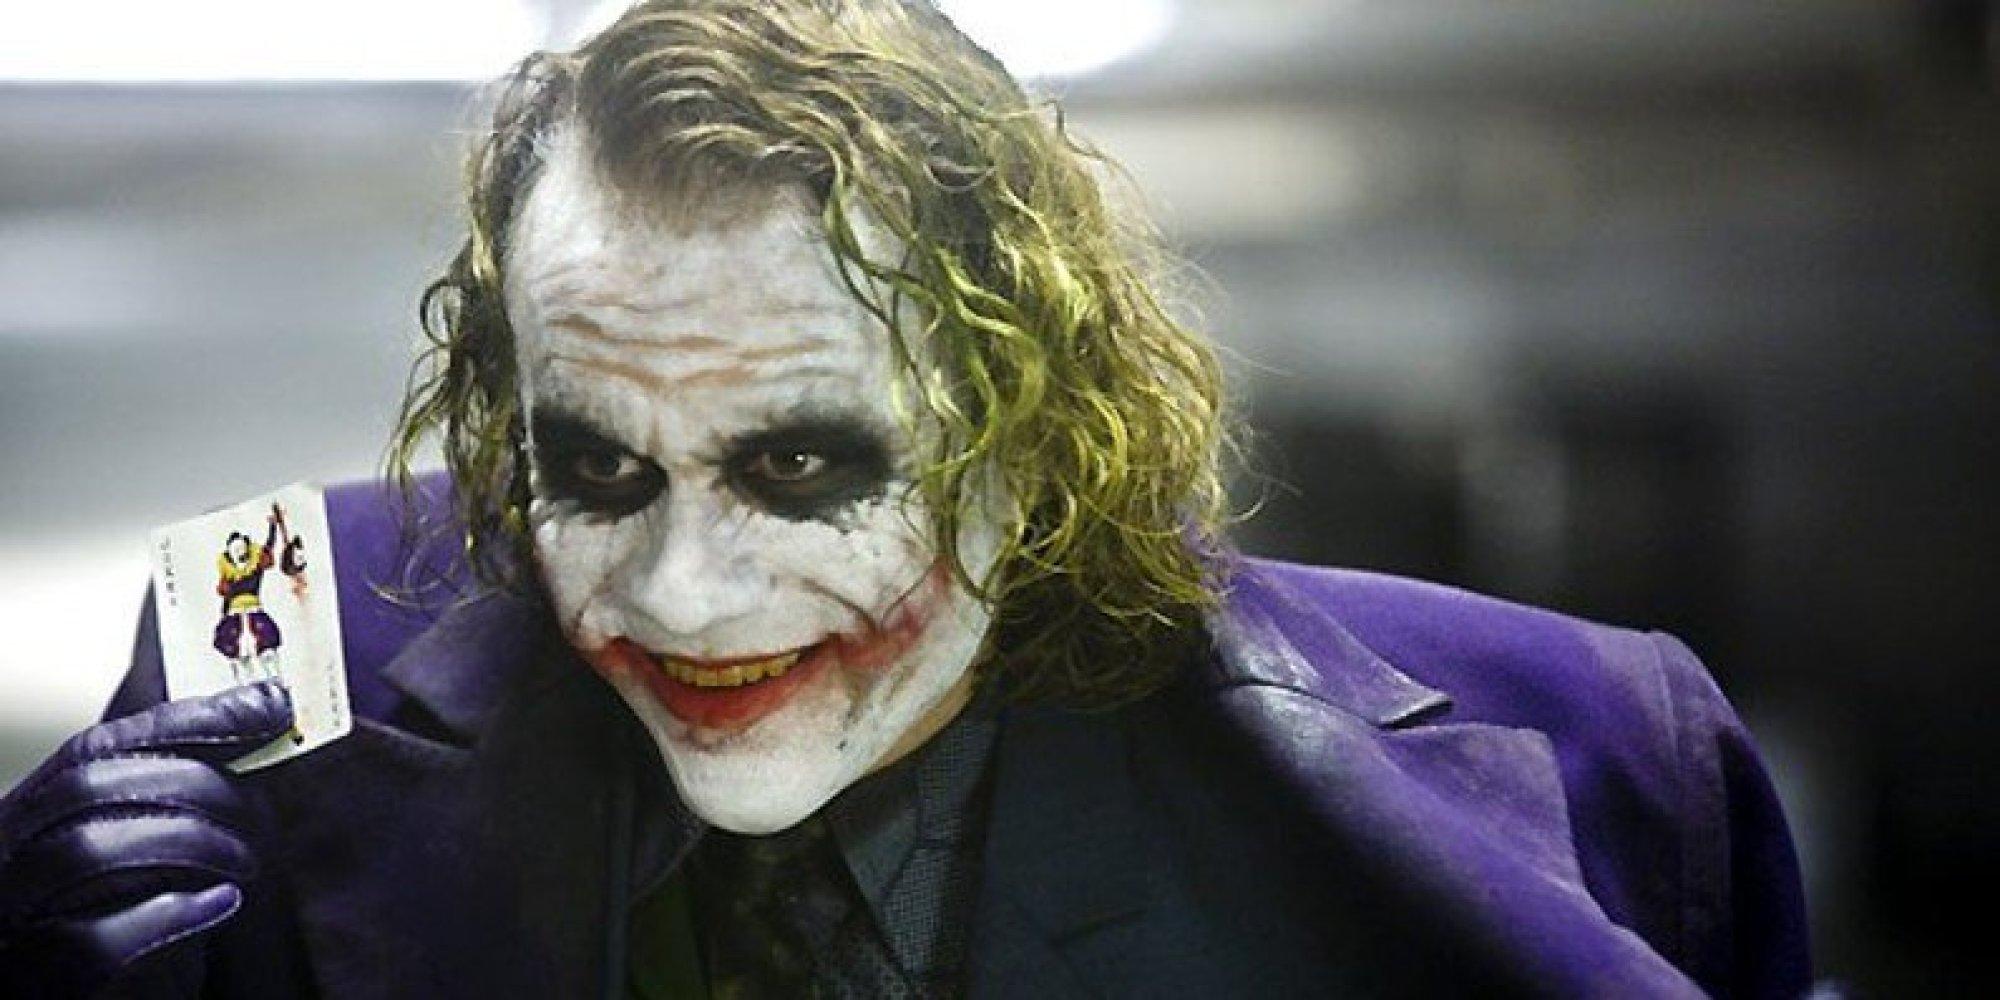 Martin Scorcese produira un film sur les origines du Joker